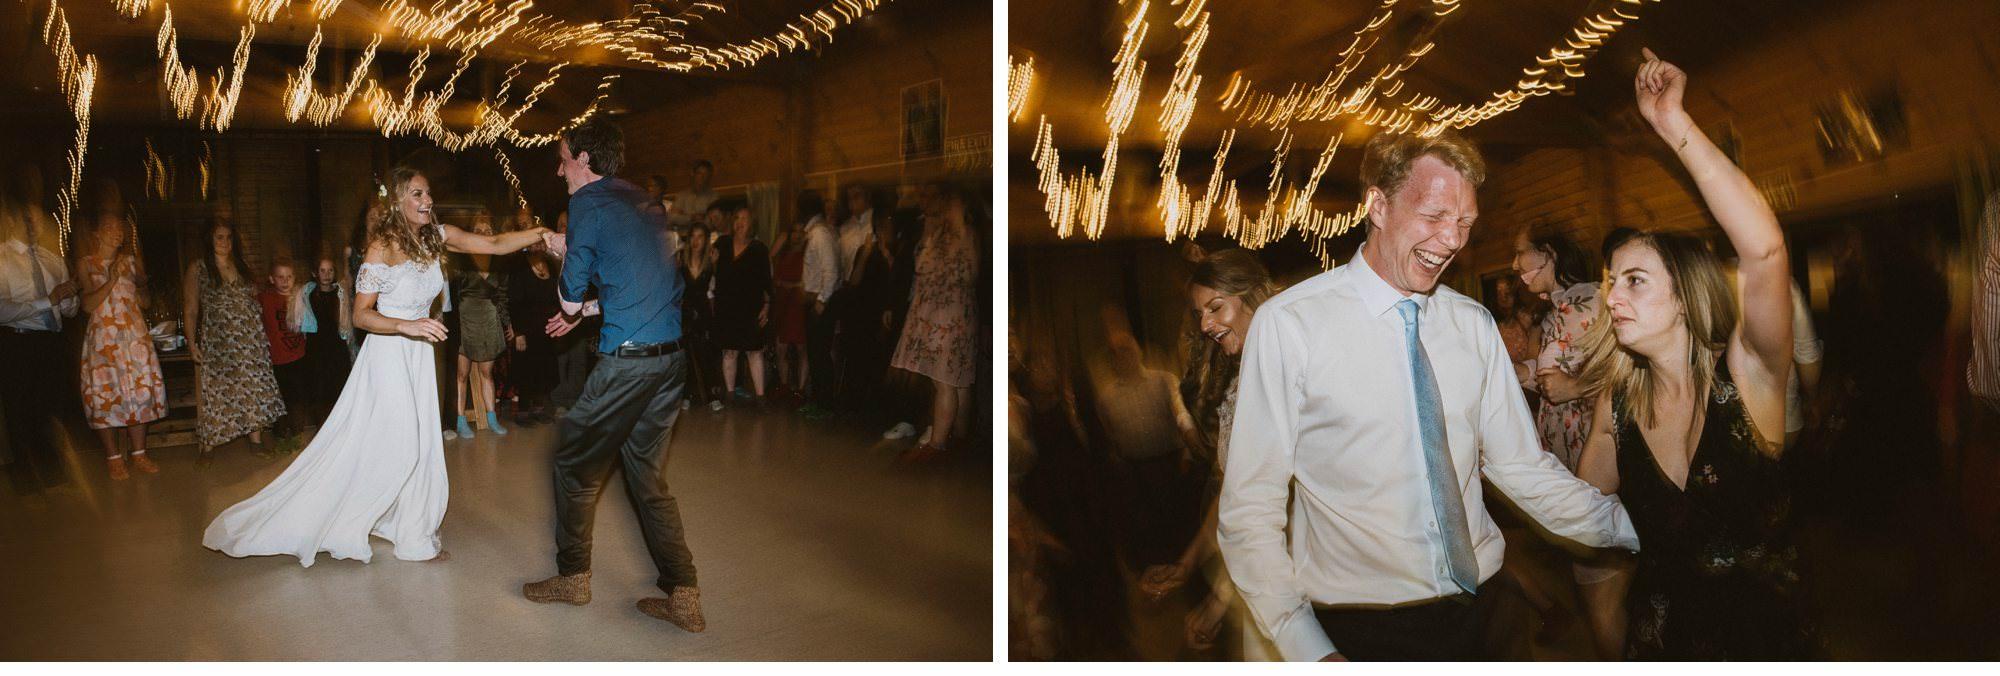 Castle-Hill-Lodge-Wedding-032.jpg